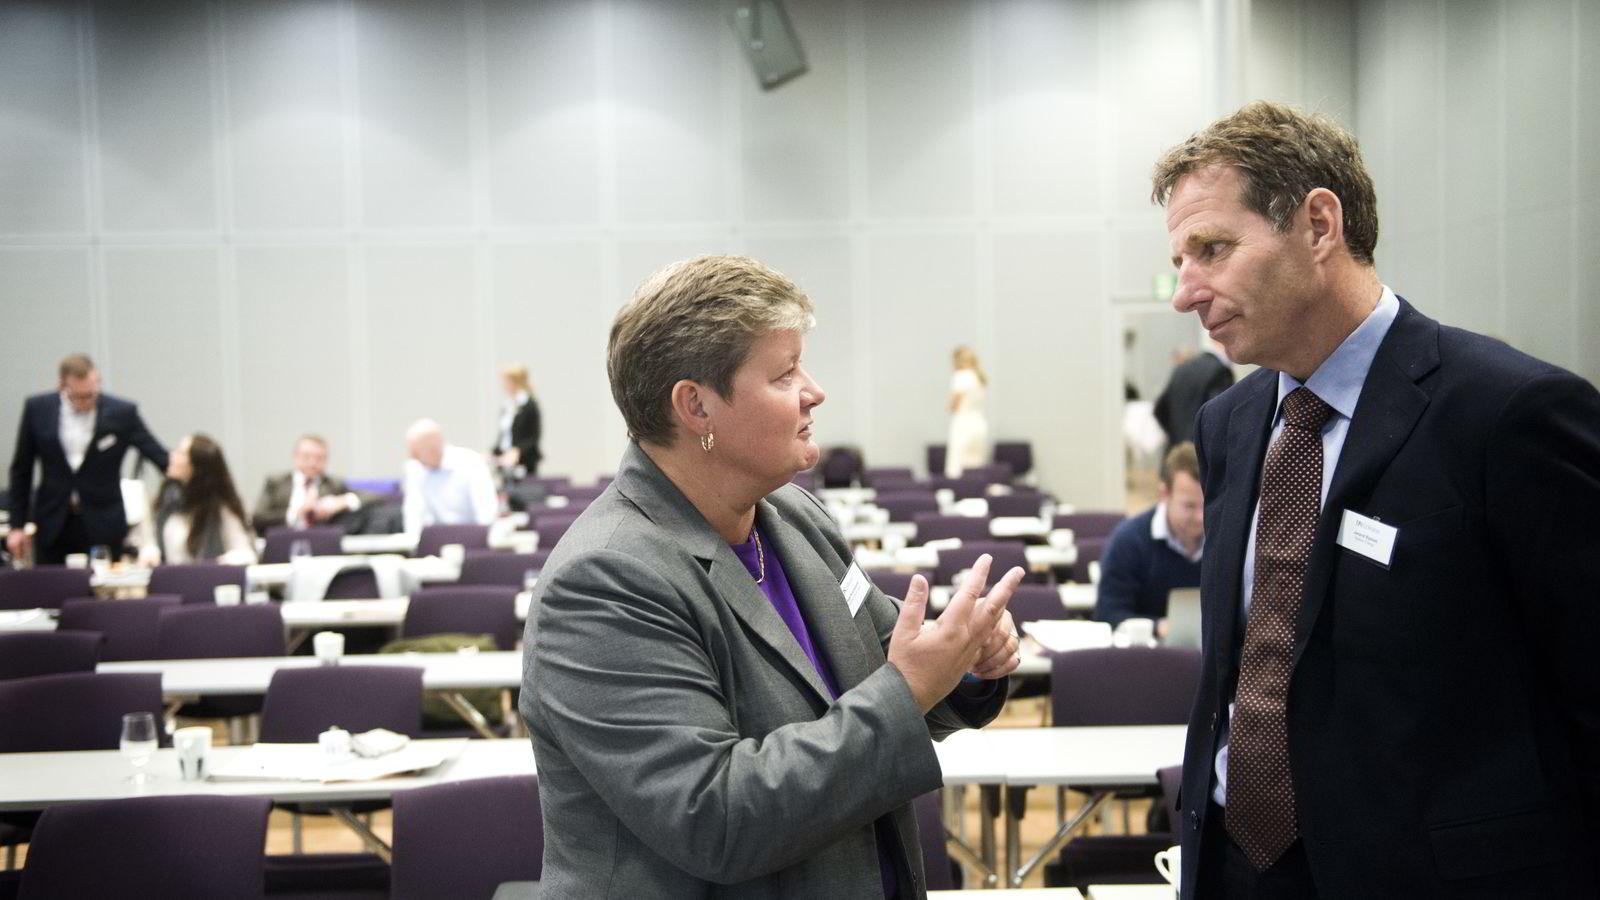 Teknologidirektør Hege Kverneland i National Oilwell Varco (t.v.),her i samtale med  Jarand Rystad, administrerende direktør i Rystad Engergy, på DNs energikonferanse på Ullevål Business Center, Oslo onsdag.